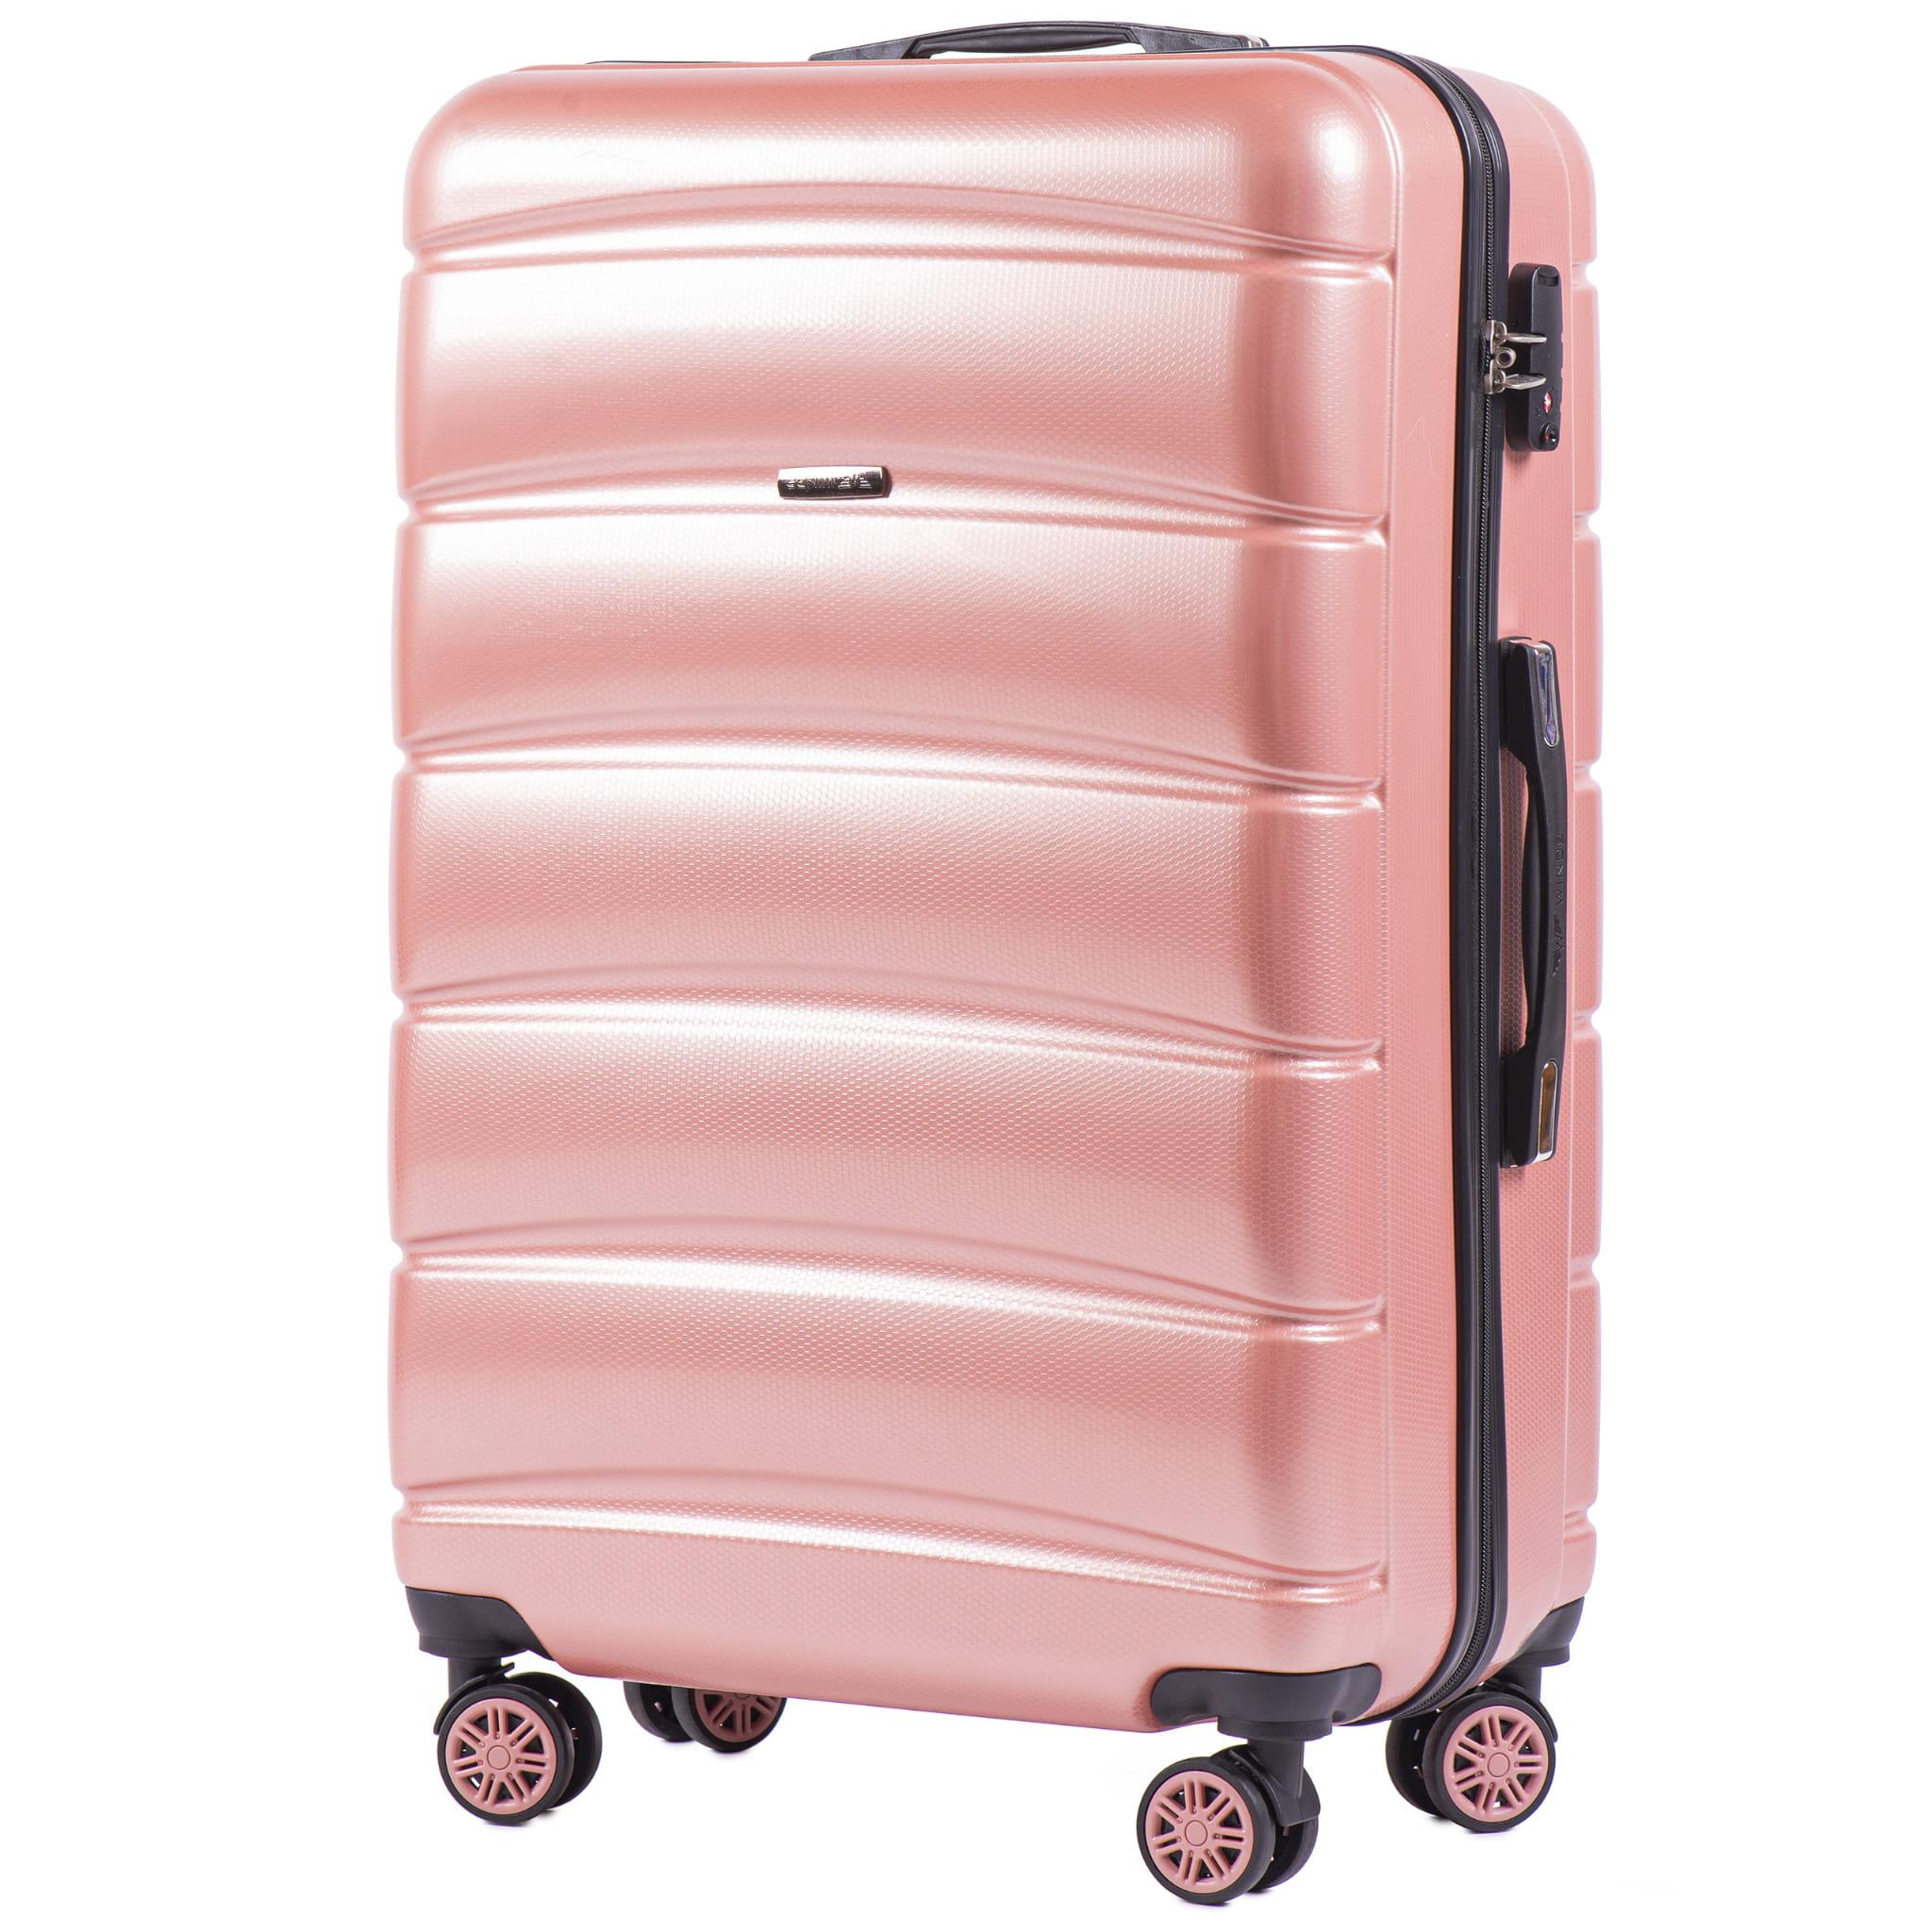 БОЛЬШОЙ ЧЕМОДАН WINGS 160 L PINK PREMIUM НА 4-Х КАУЧУКОВЫХ КОЛЕСАХ! Для багажа ,до 23 кг!